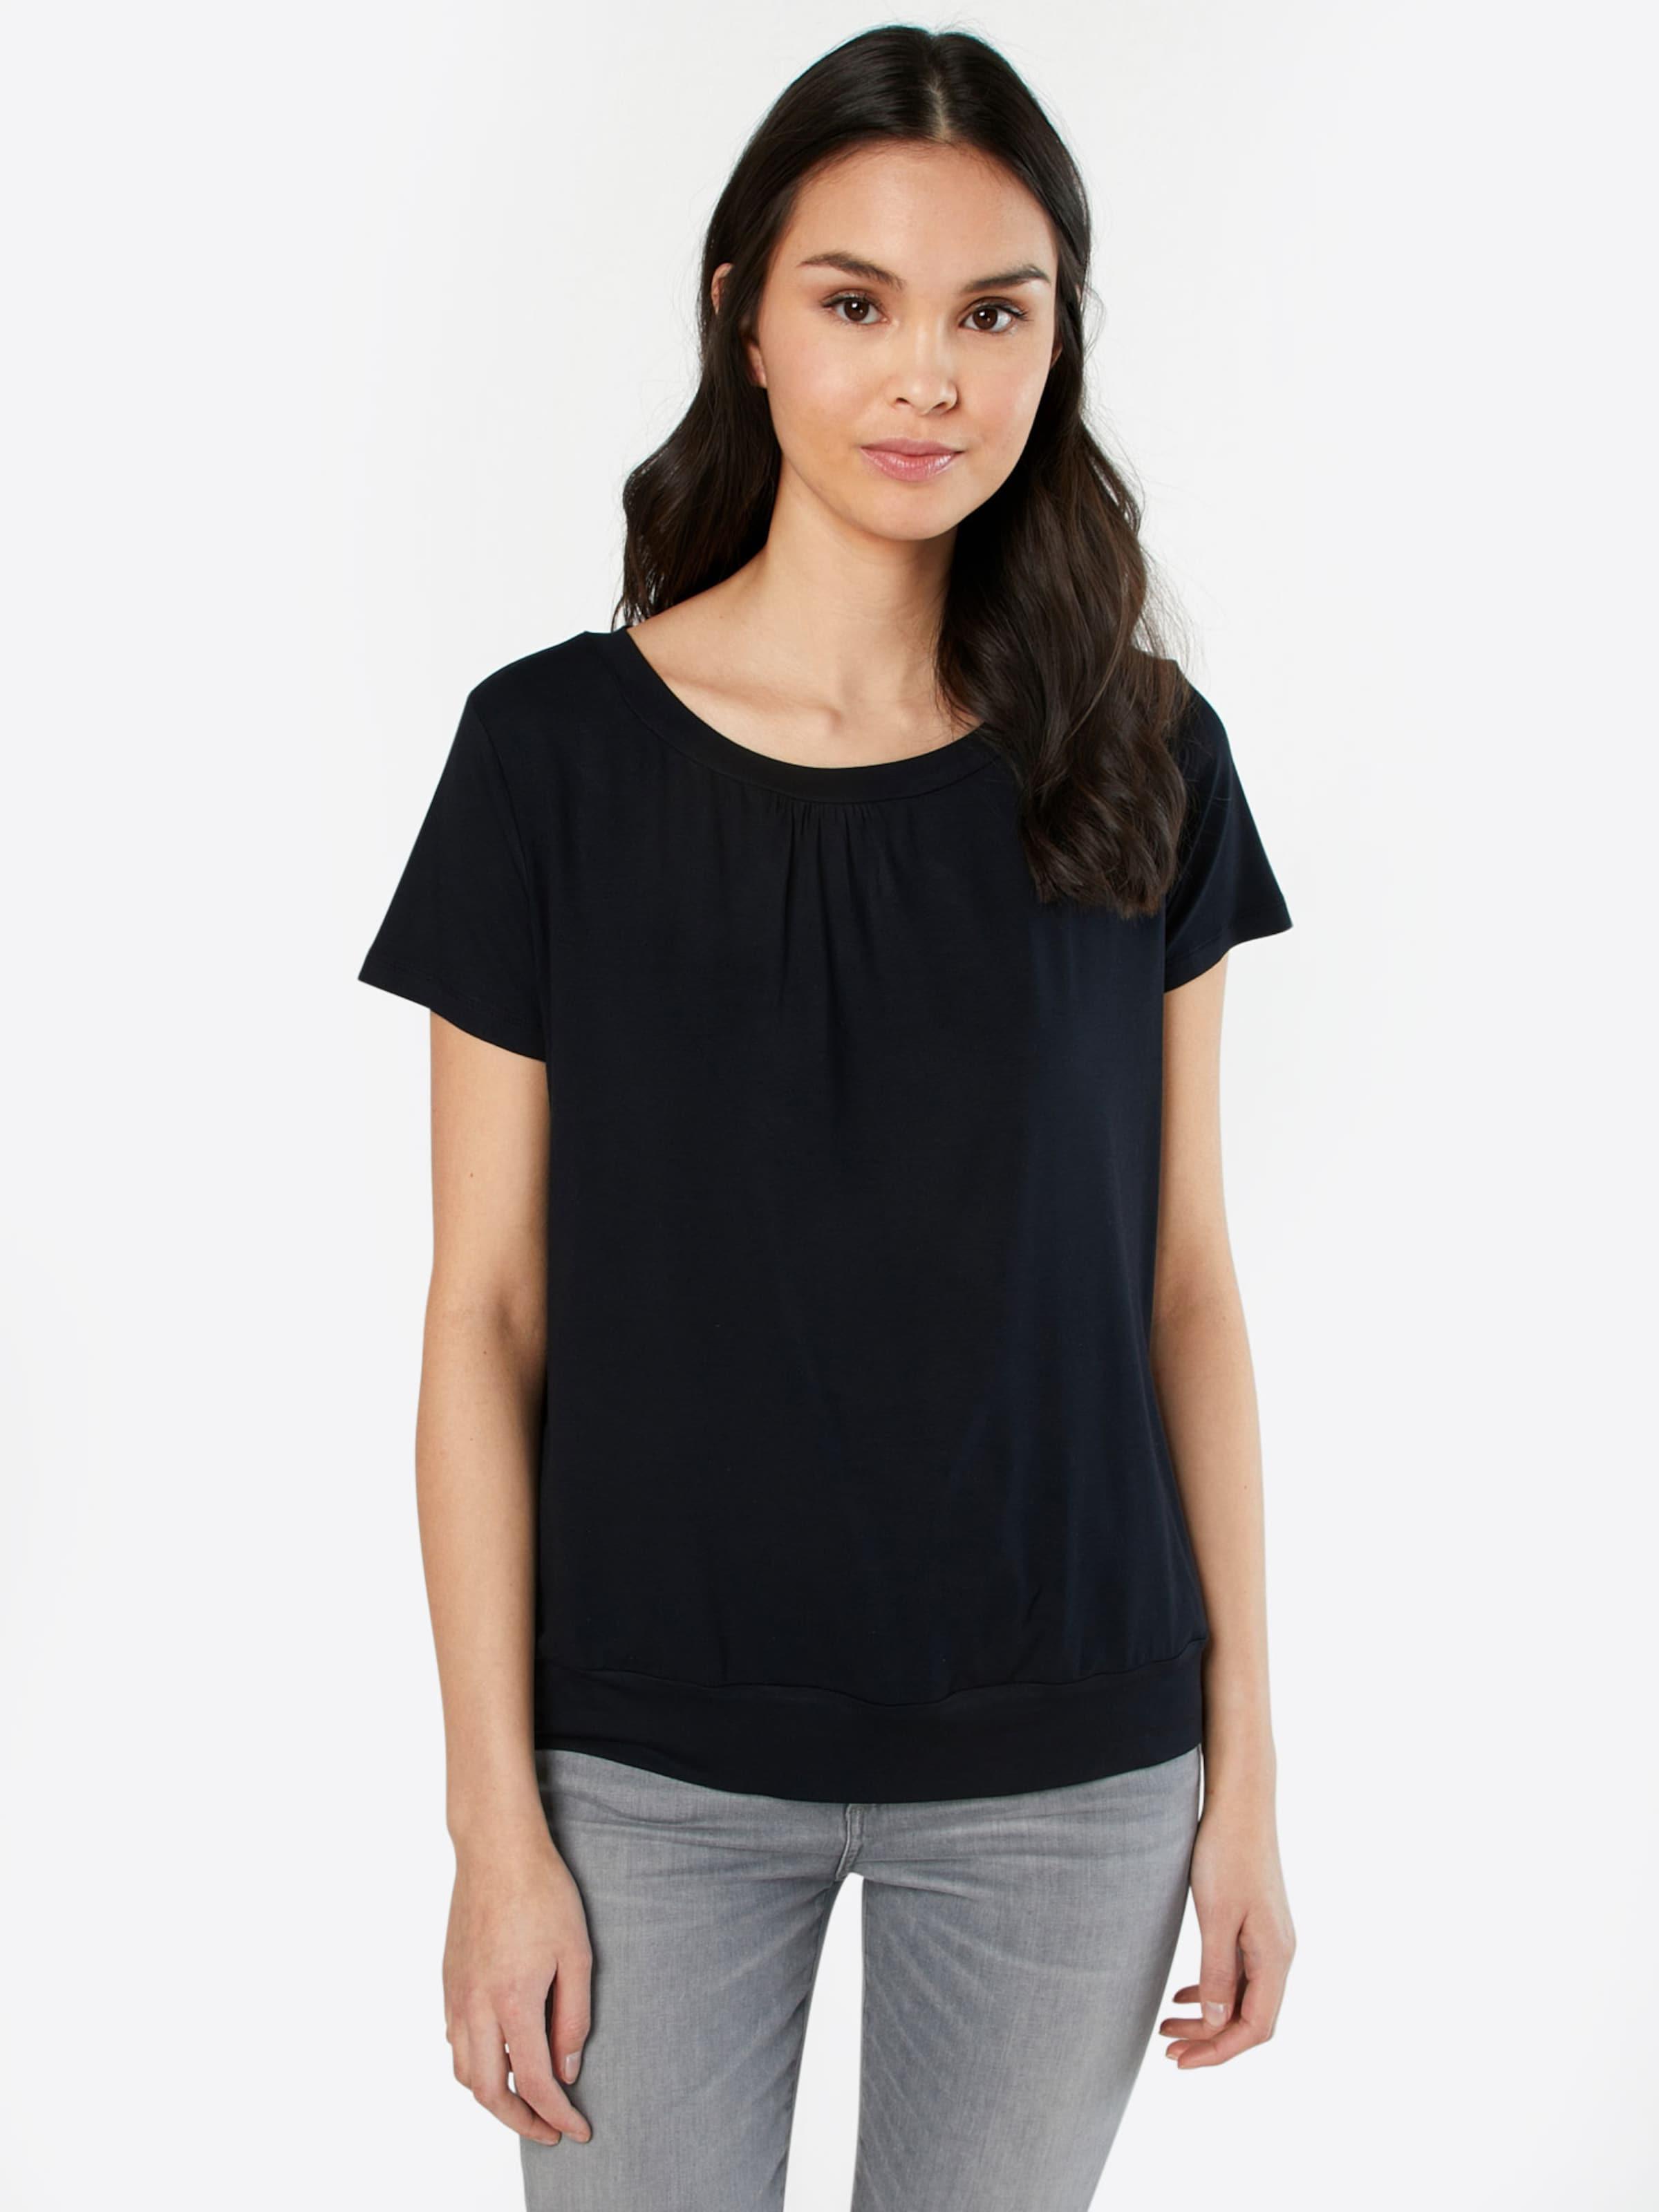 ABOUT YOU Basics Jerseyshirt 'Ester'